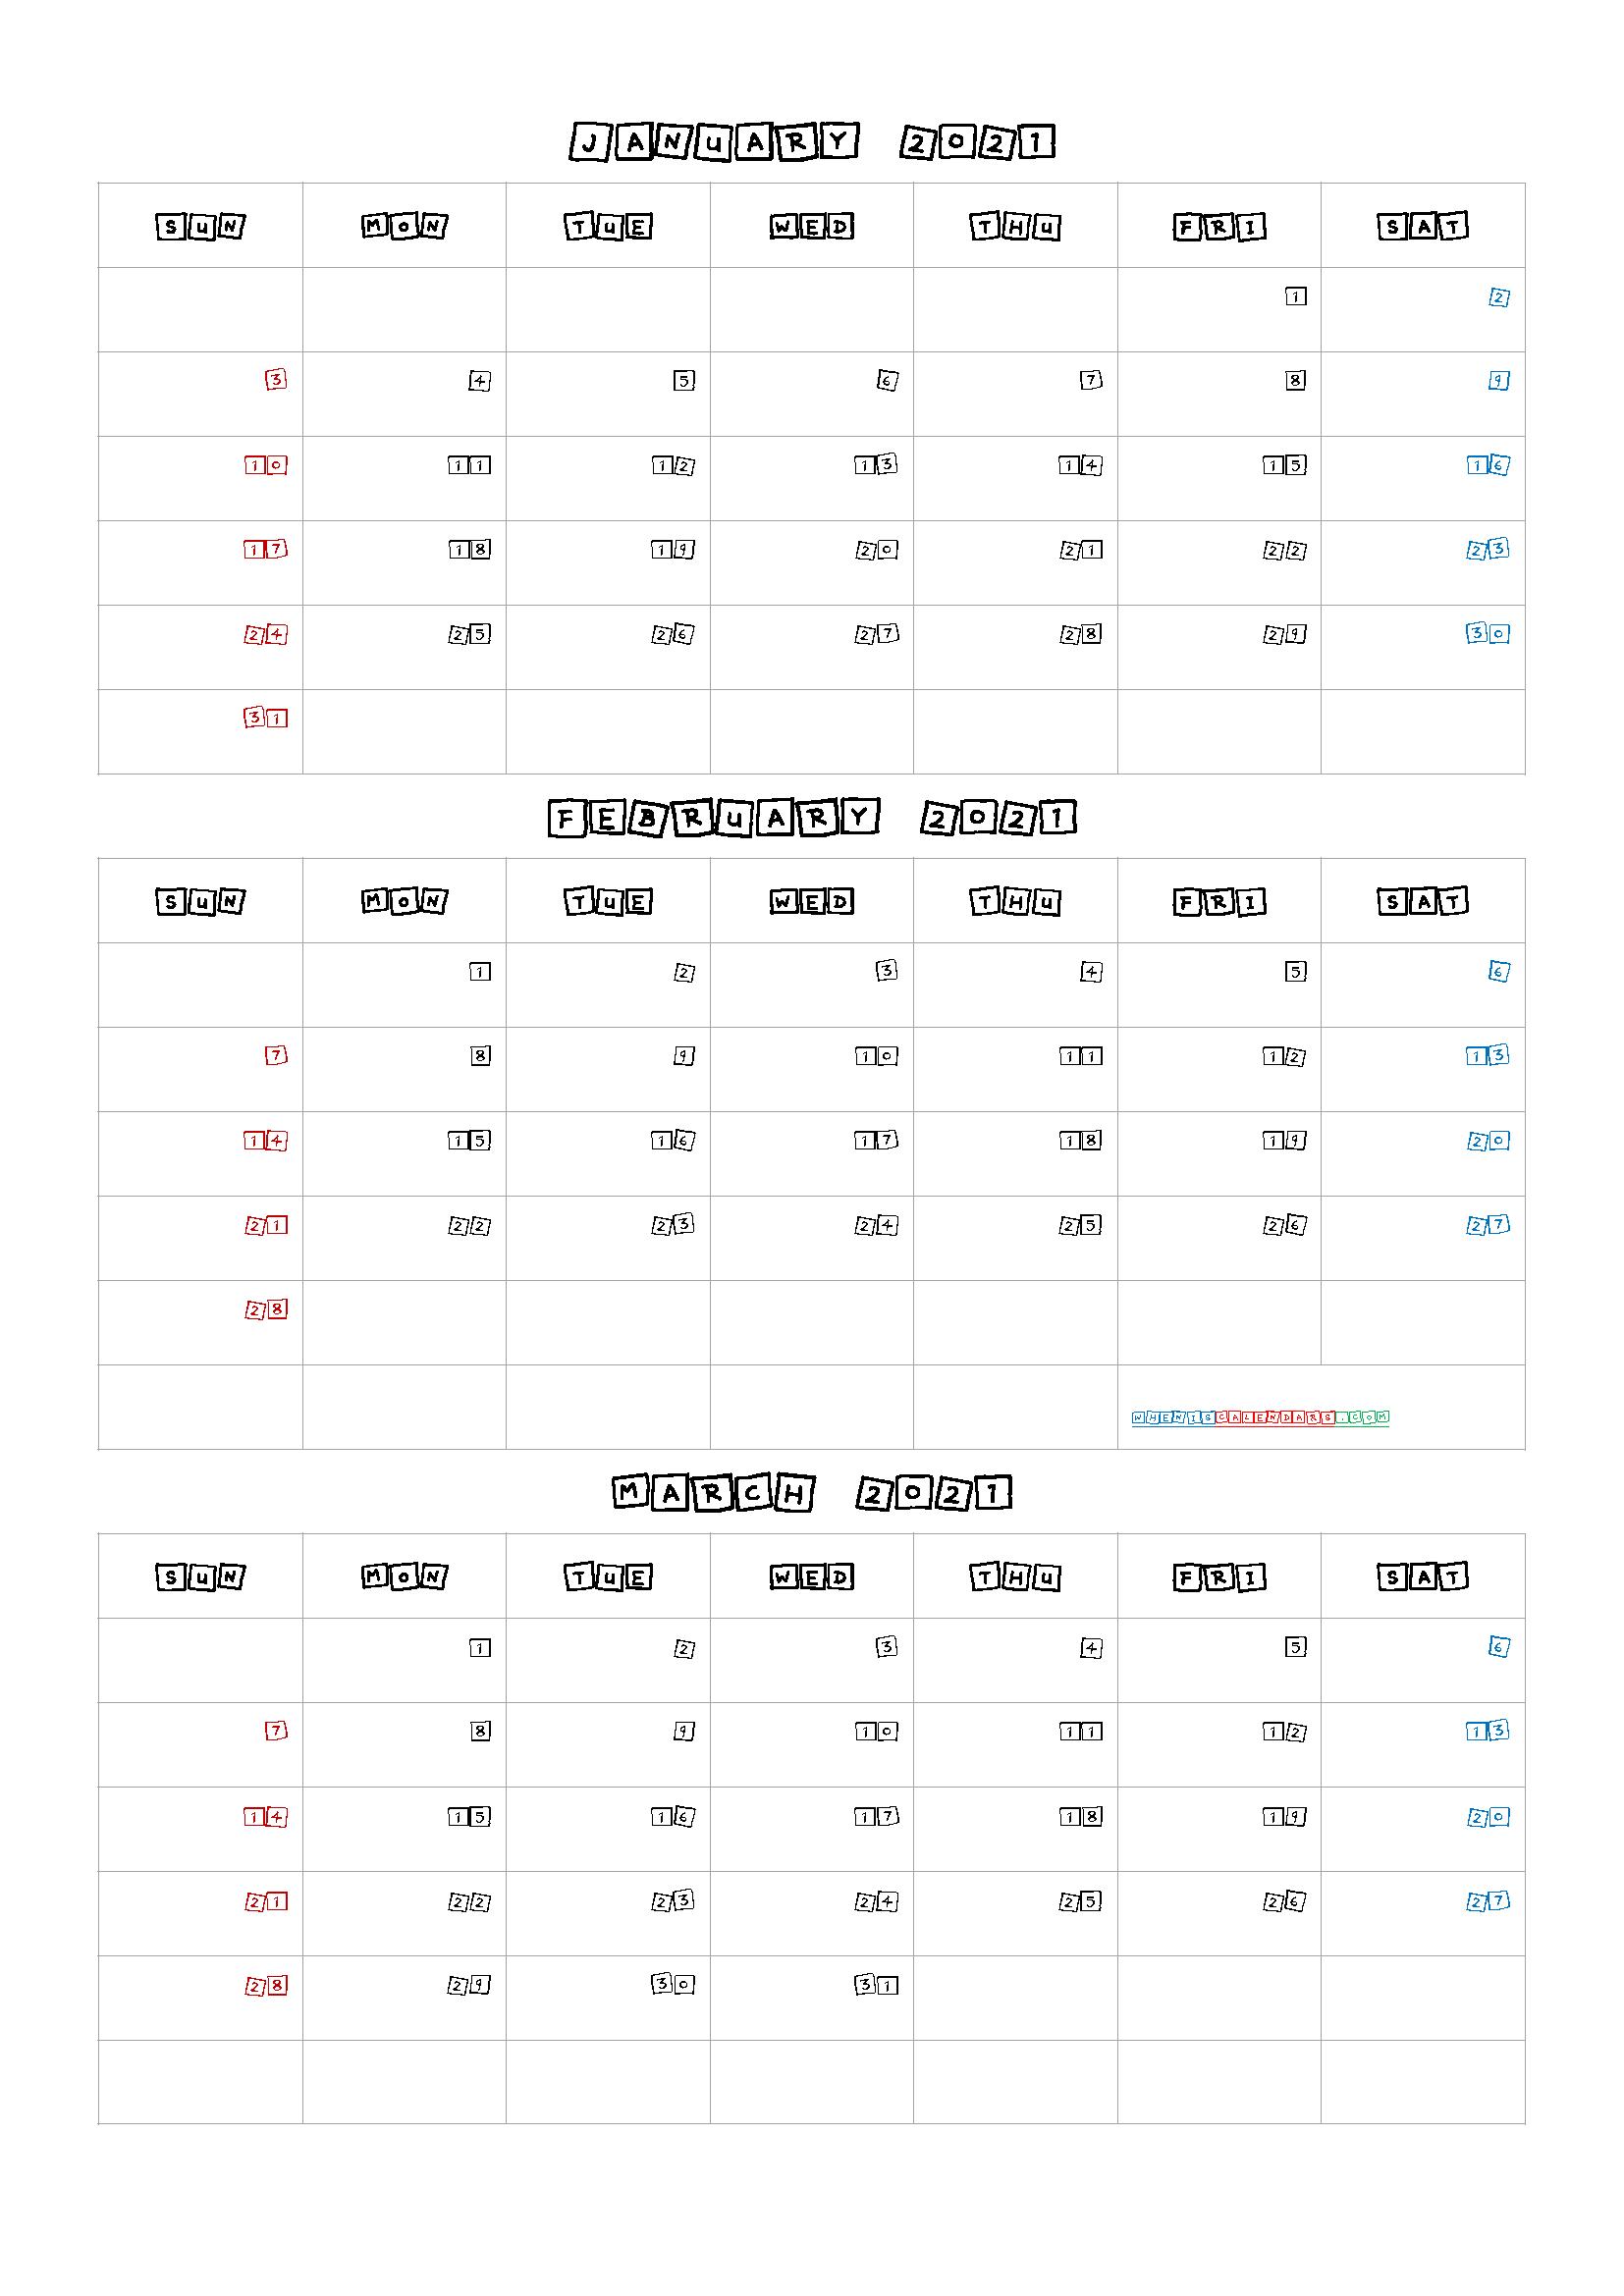 Calendar April May June 2021 [Q1 Q2 Q3 Q4] Intended For January February March April 2021 Calendar